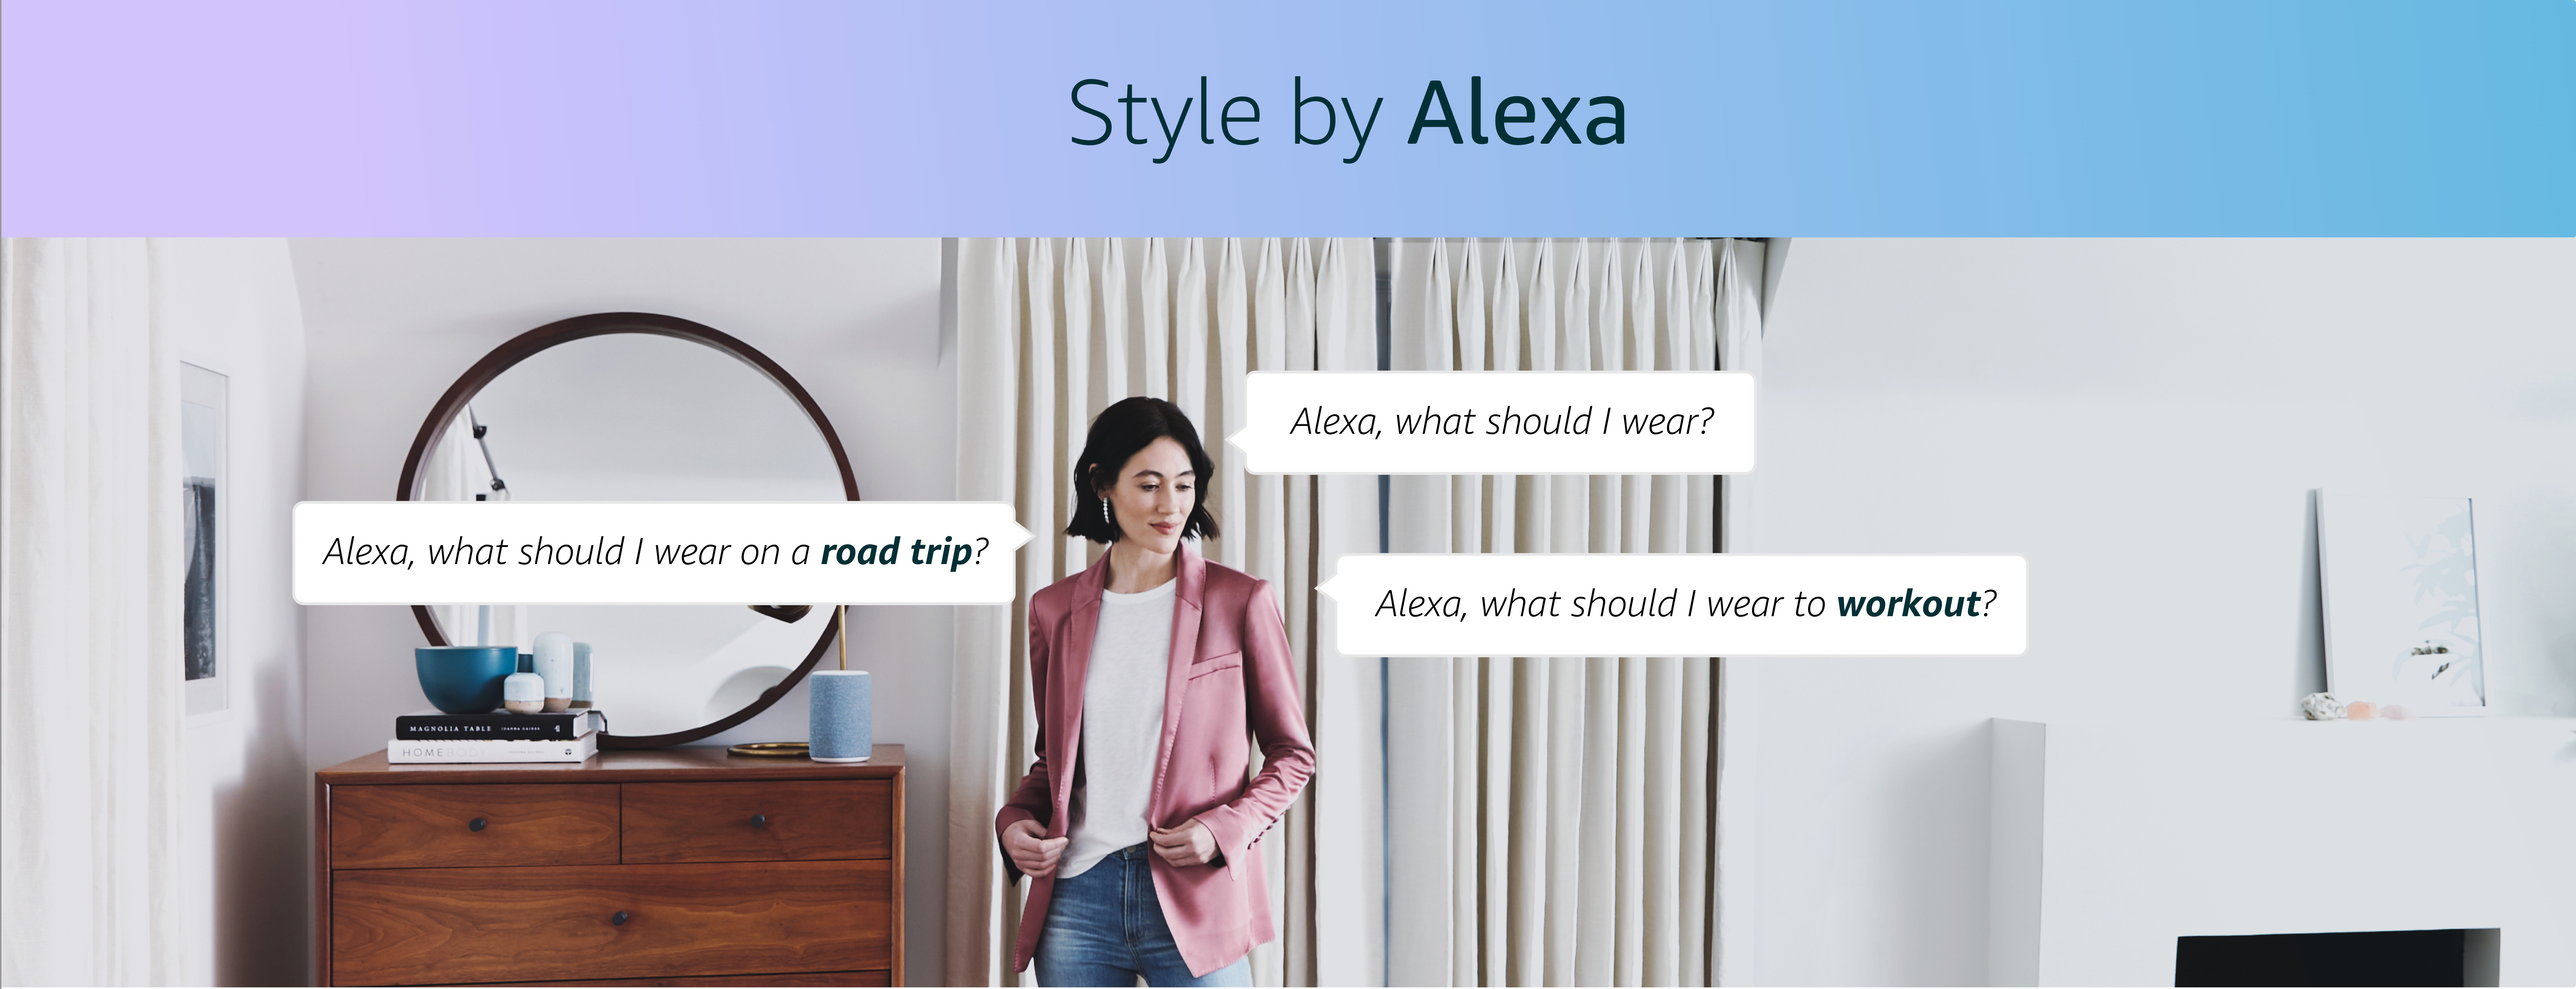 Style by Alexa